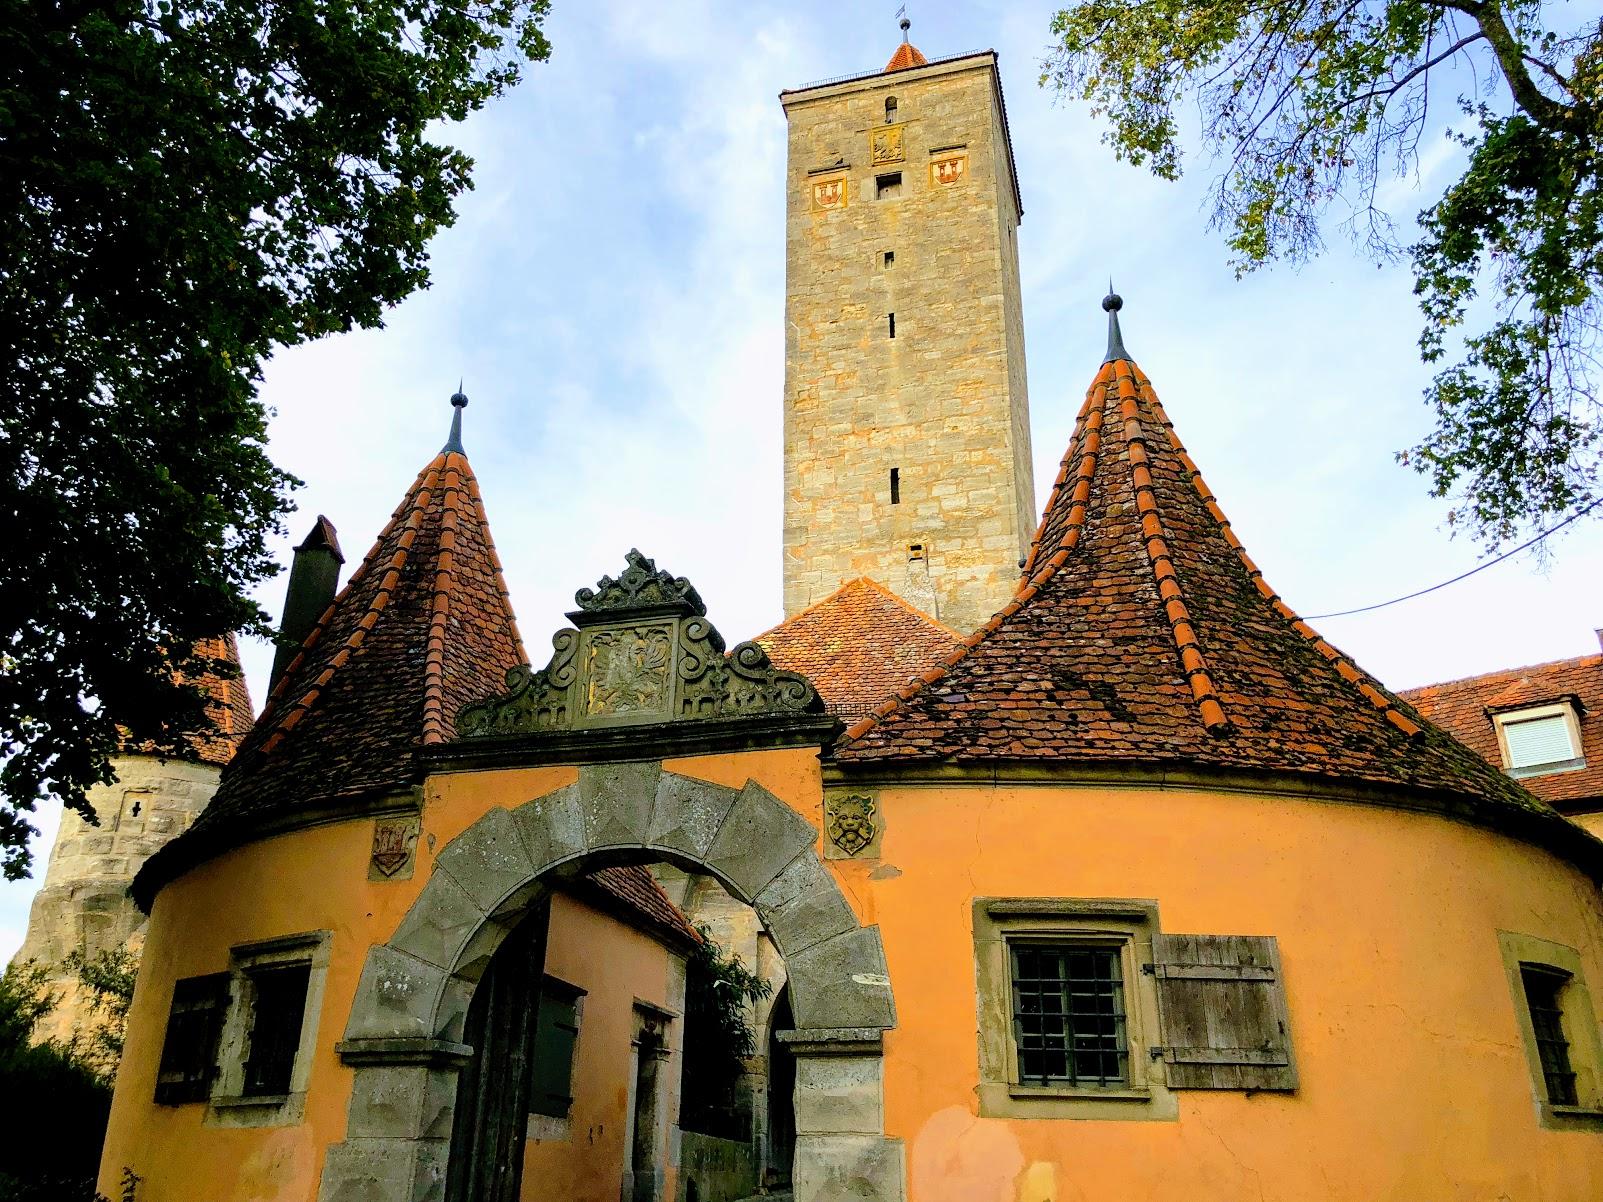 Rothenburg ob der Tauber, Germany town buildings